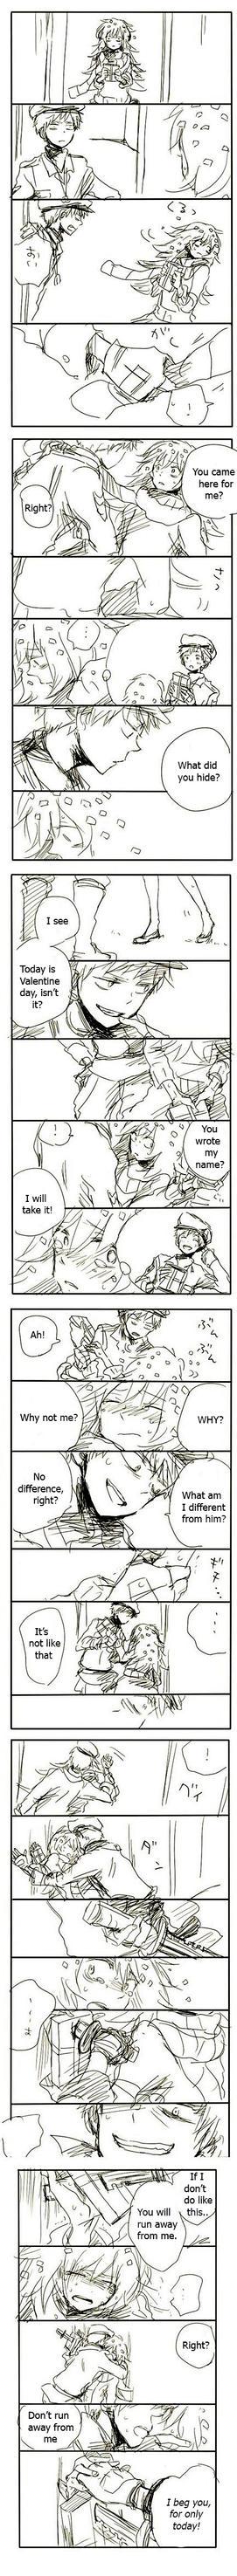 HTF doujinshi 62: Don't run away from me. by minglee7294